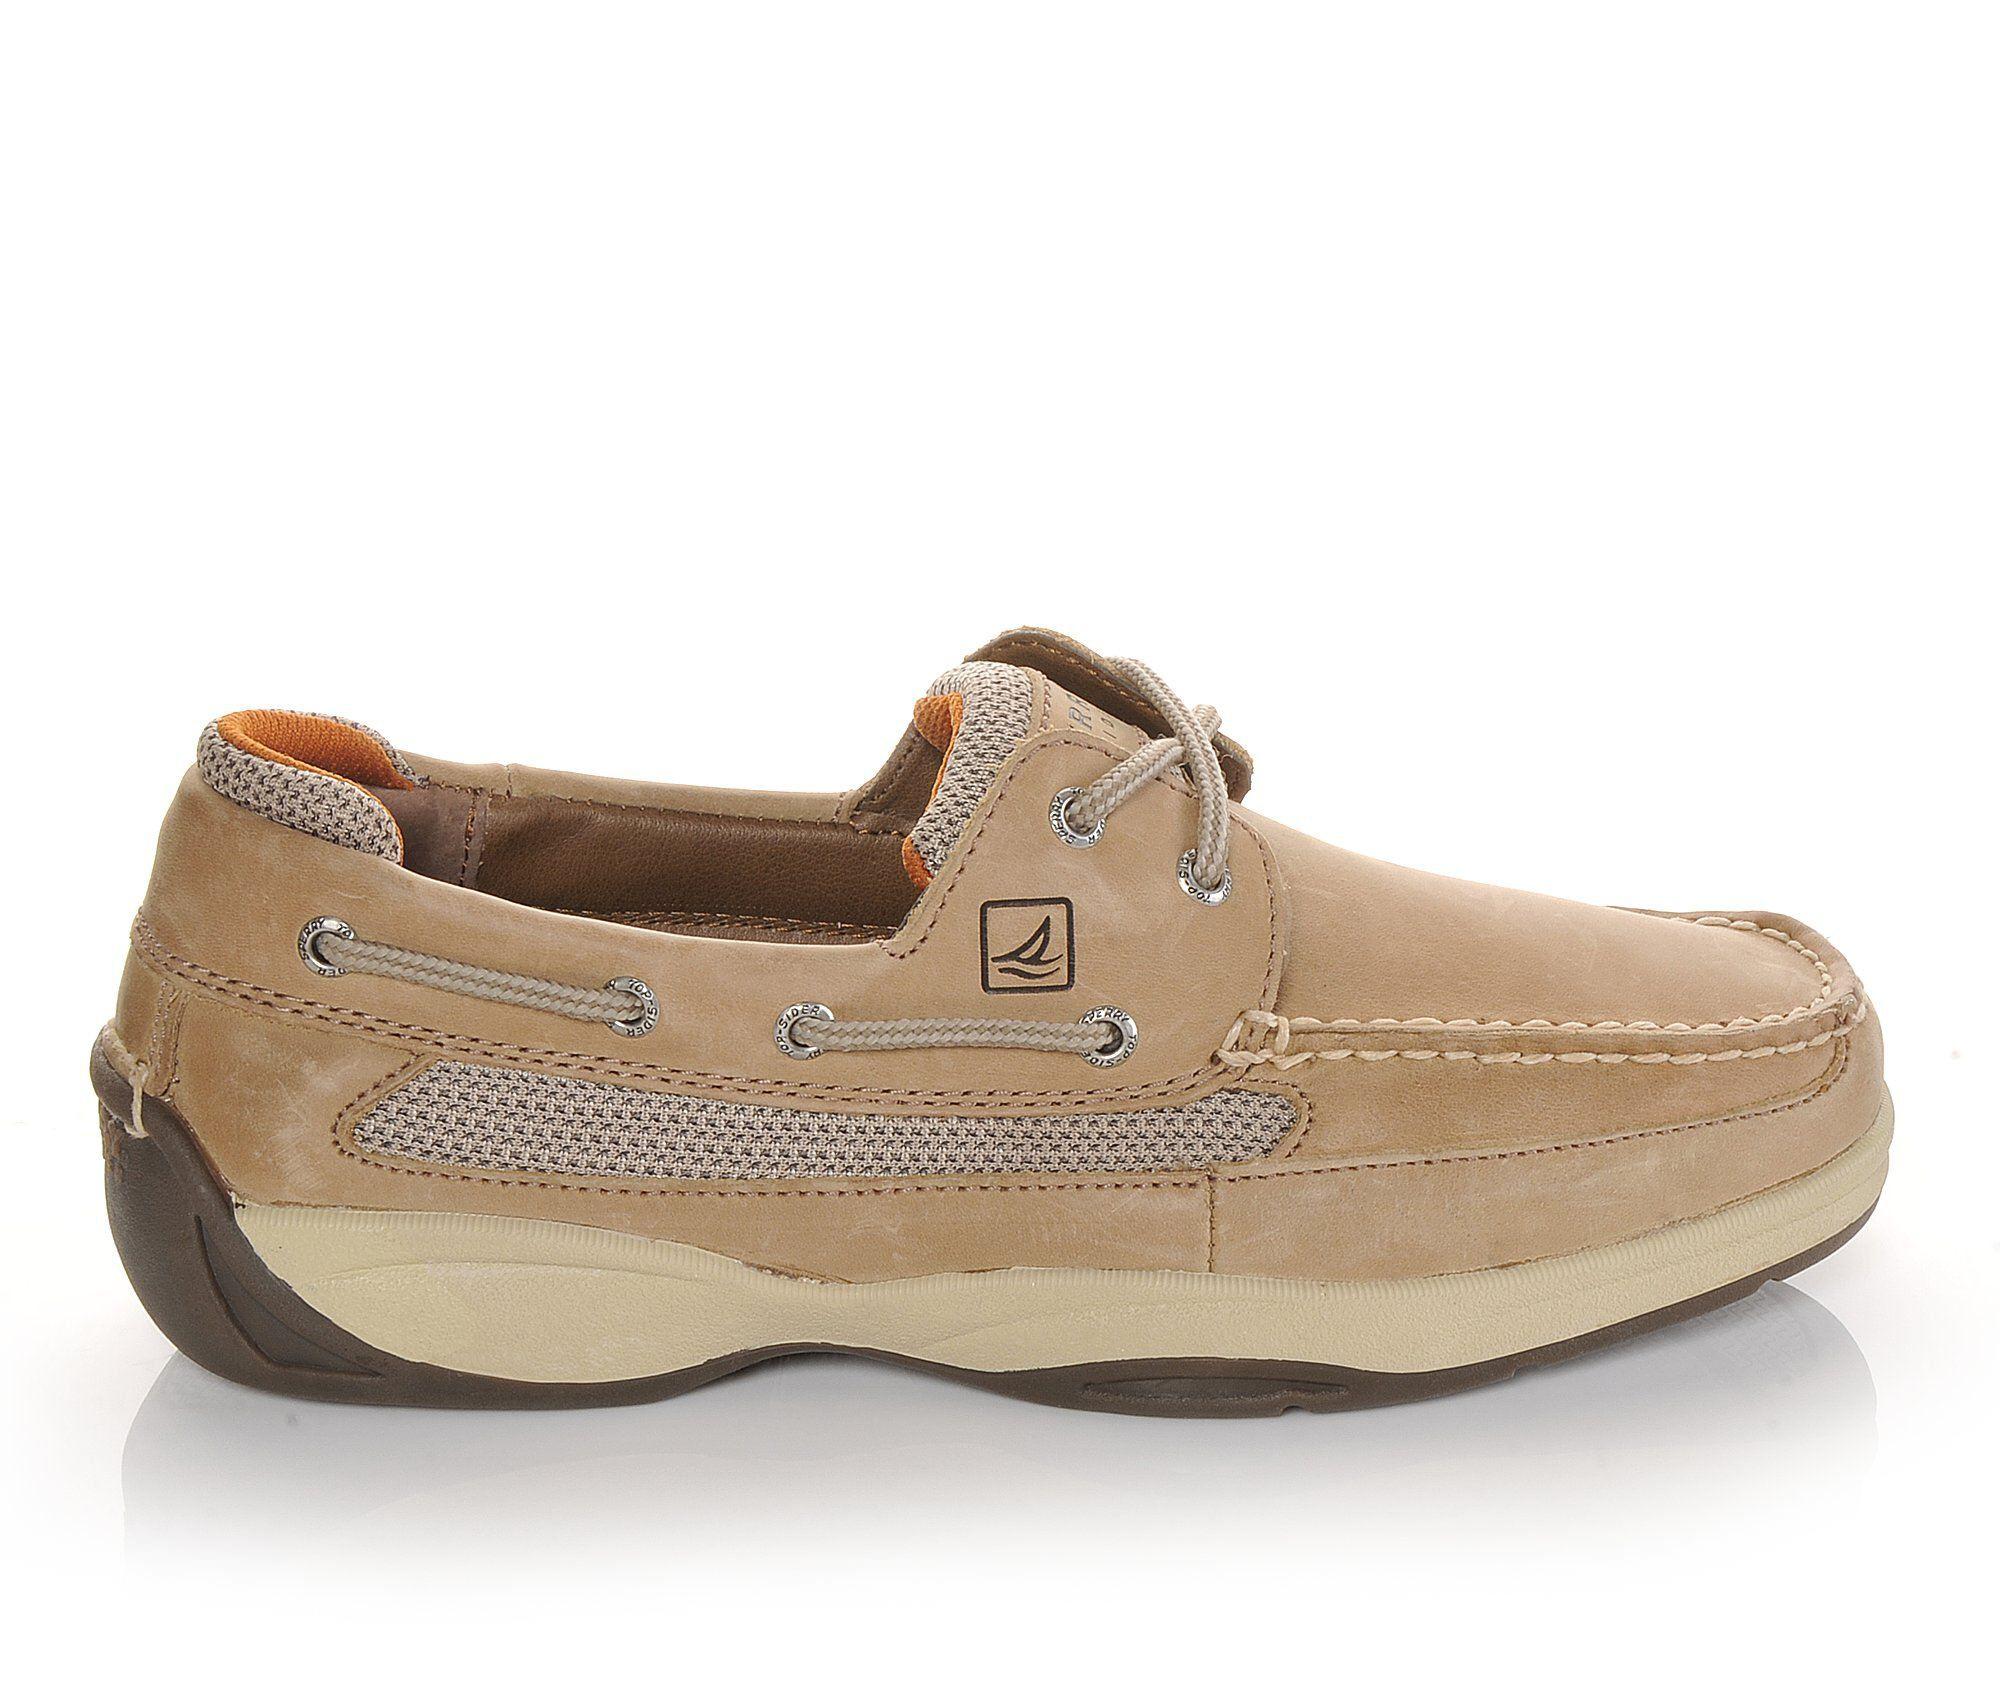 Wholesale UK Men's Sperry Lanyard Boat Shoes Linen